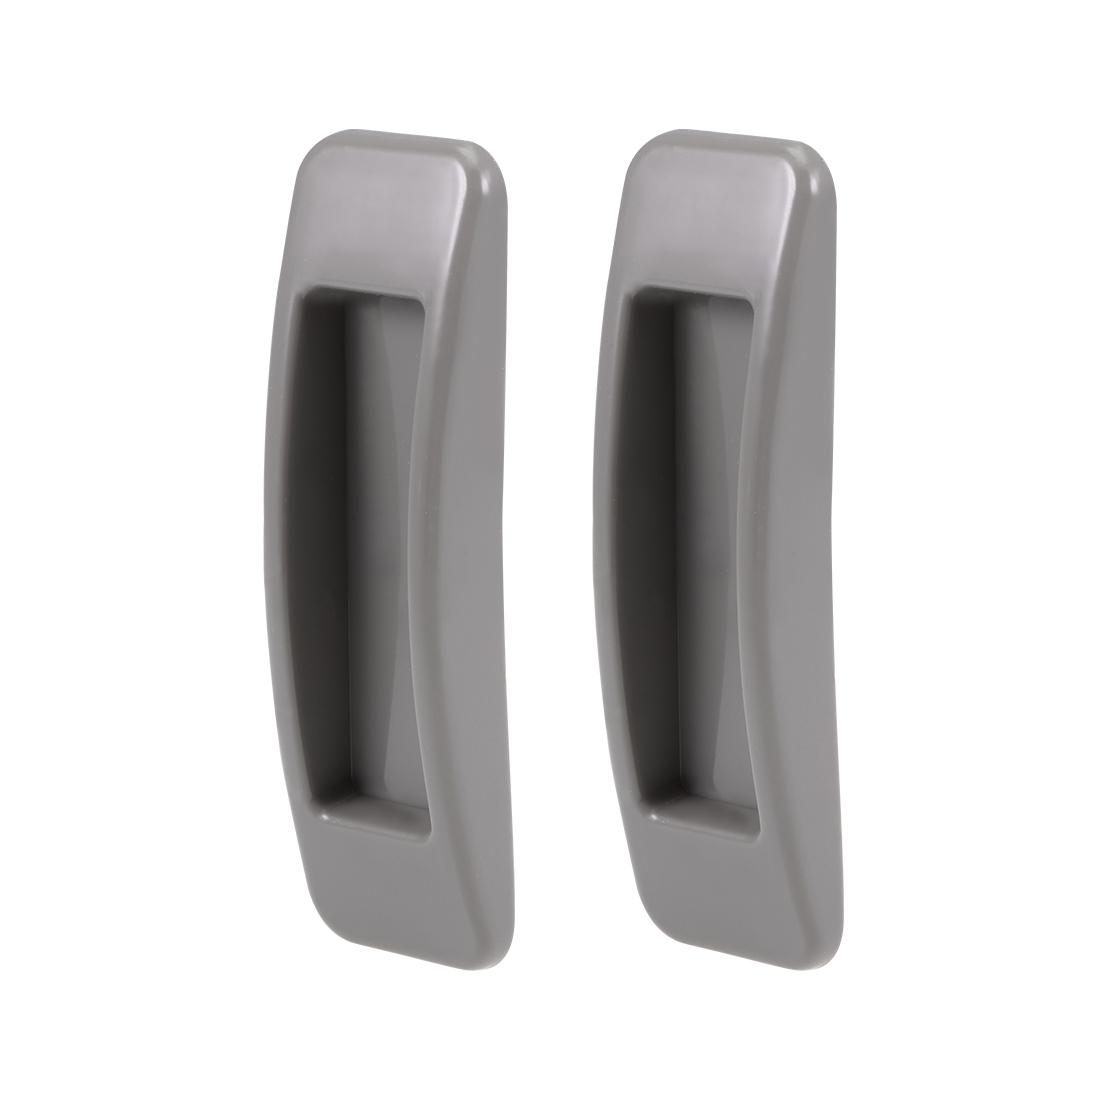 Self-Stick Pull Handle Stick-on Handles for Door Window ABS Plastic Grey 2 Pairs